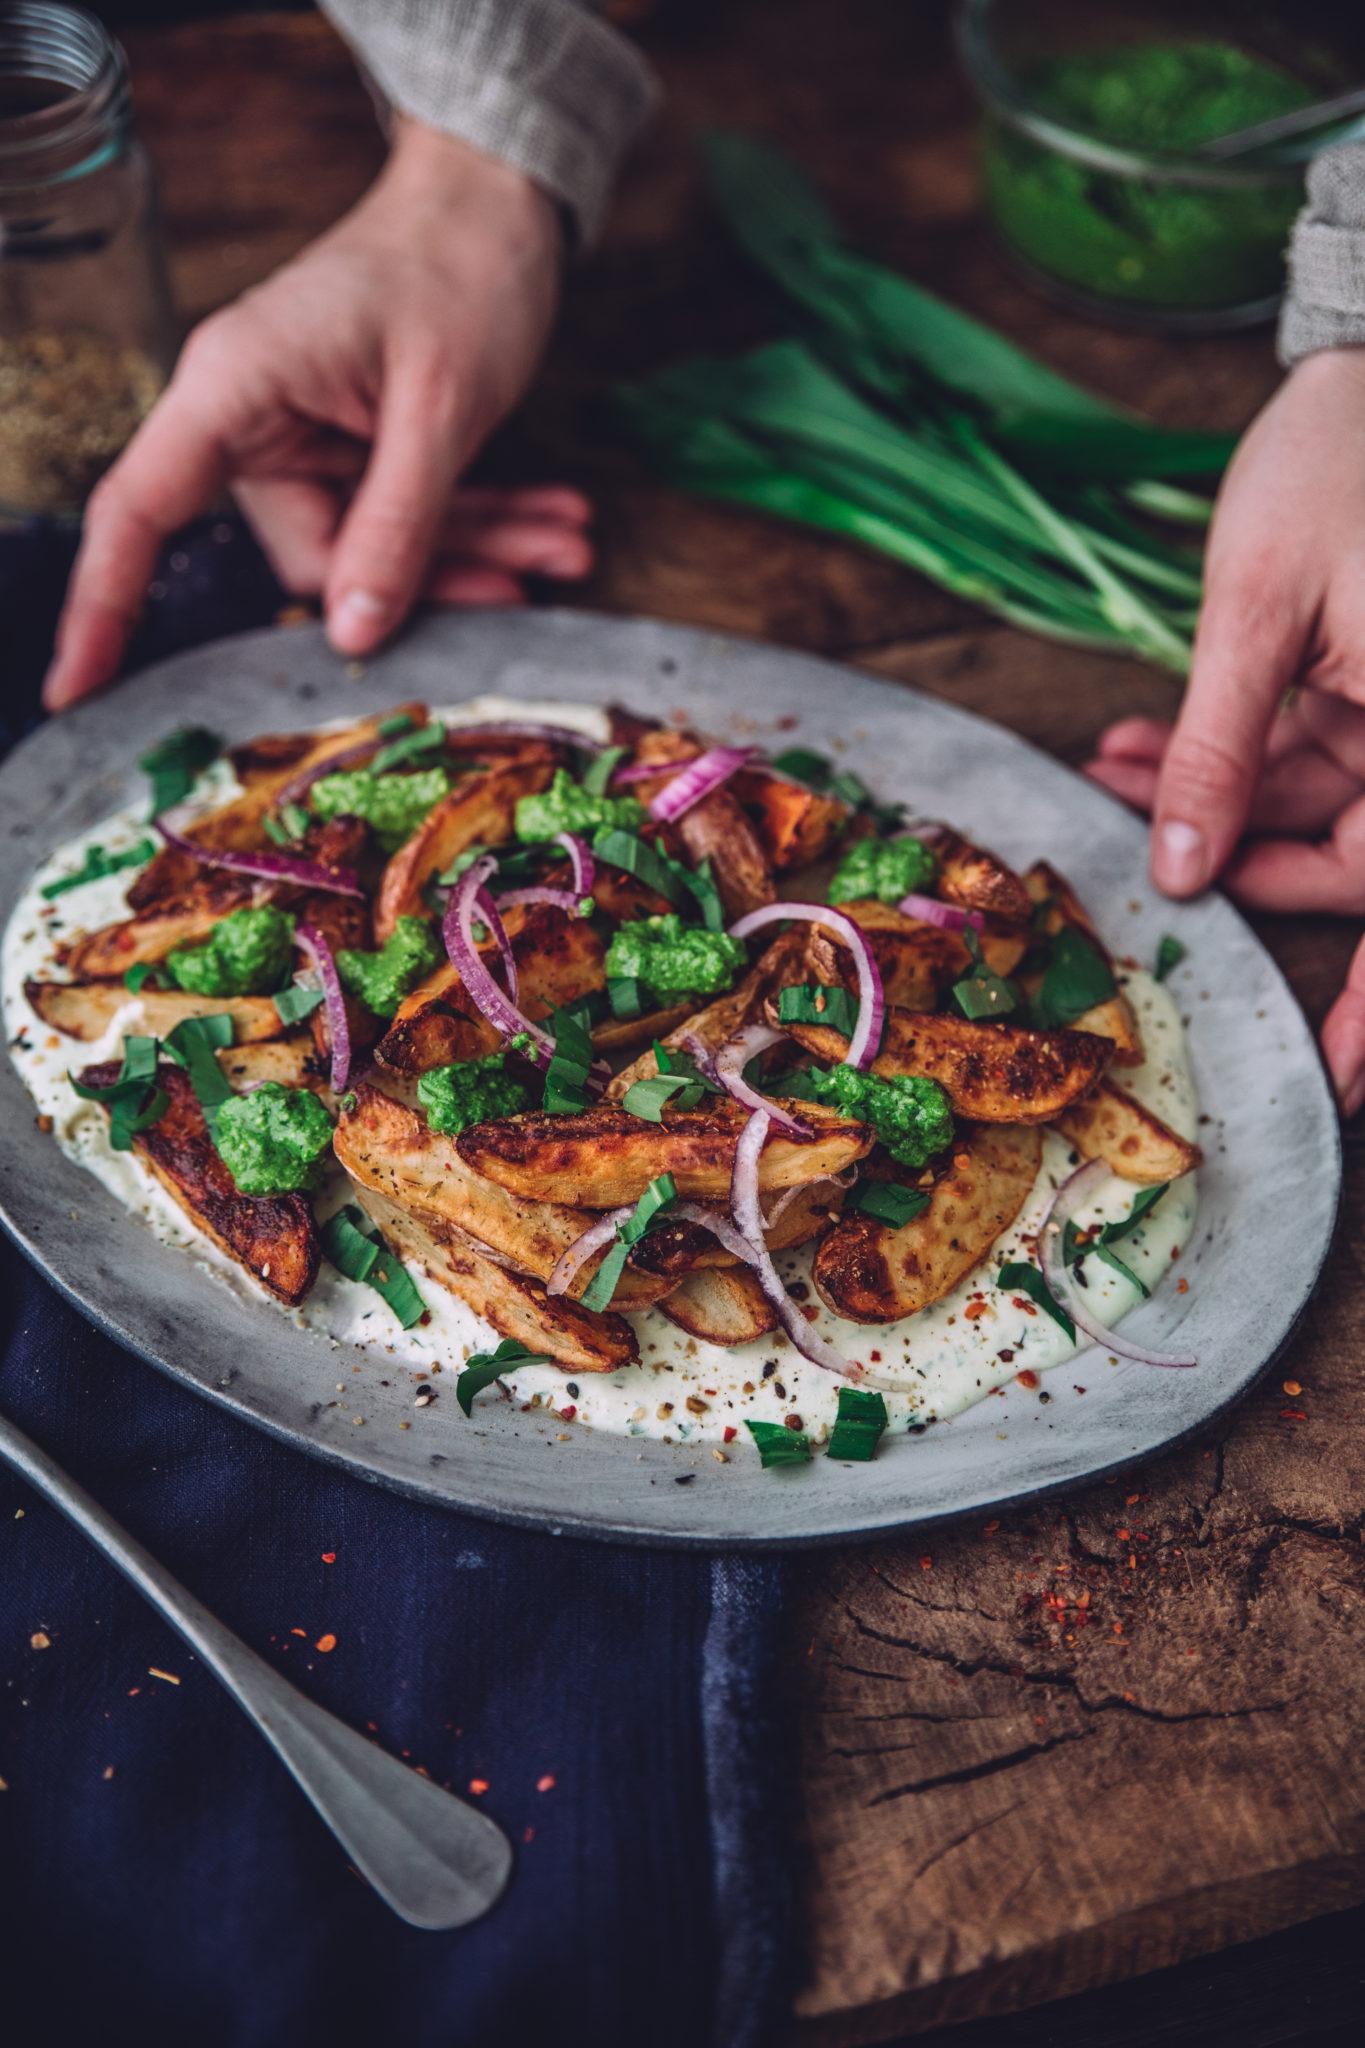 Salade printemps styliste culinaire lyon